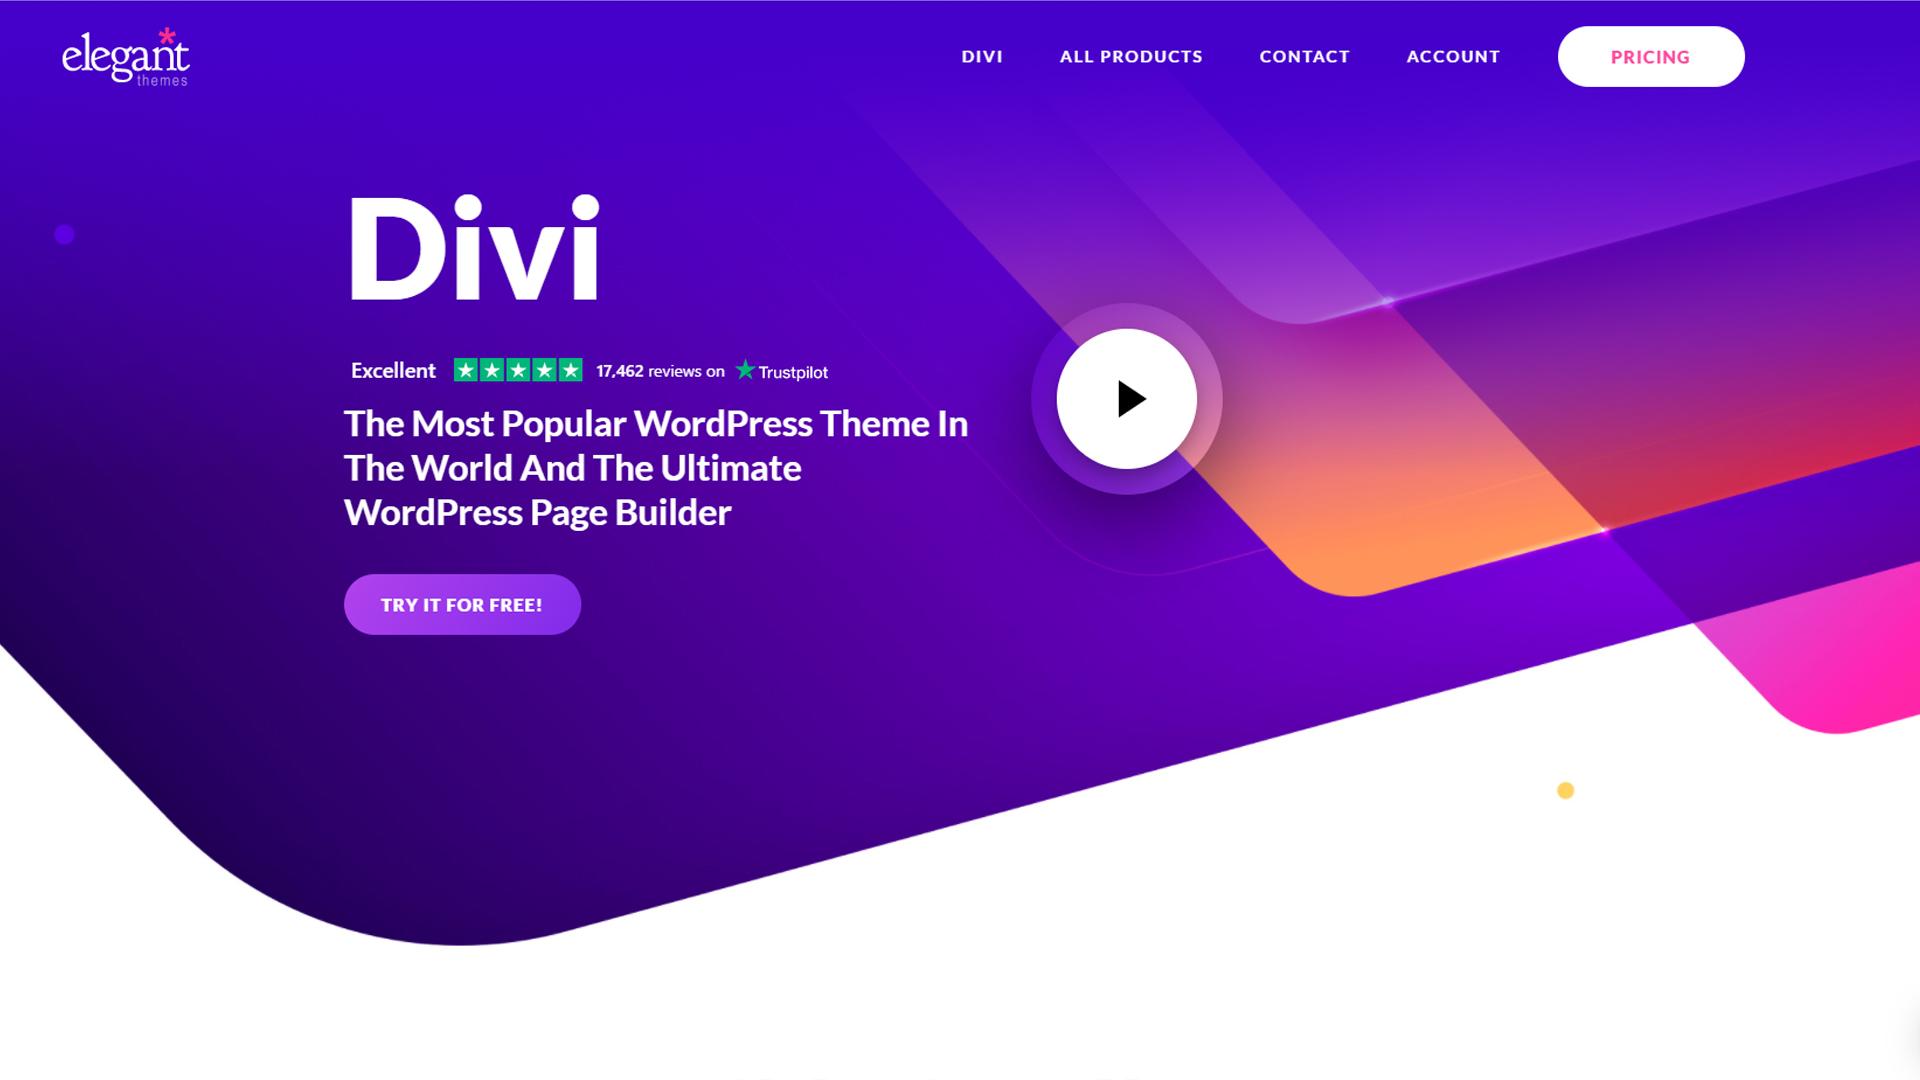 Divi's homepage